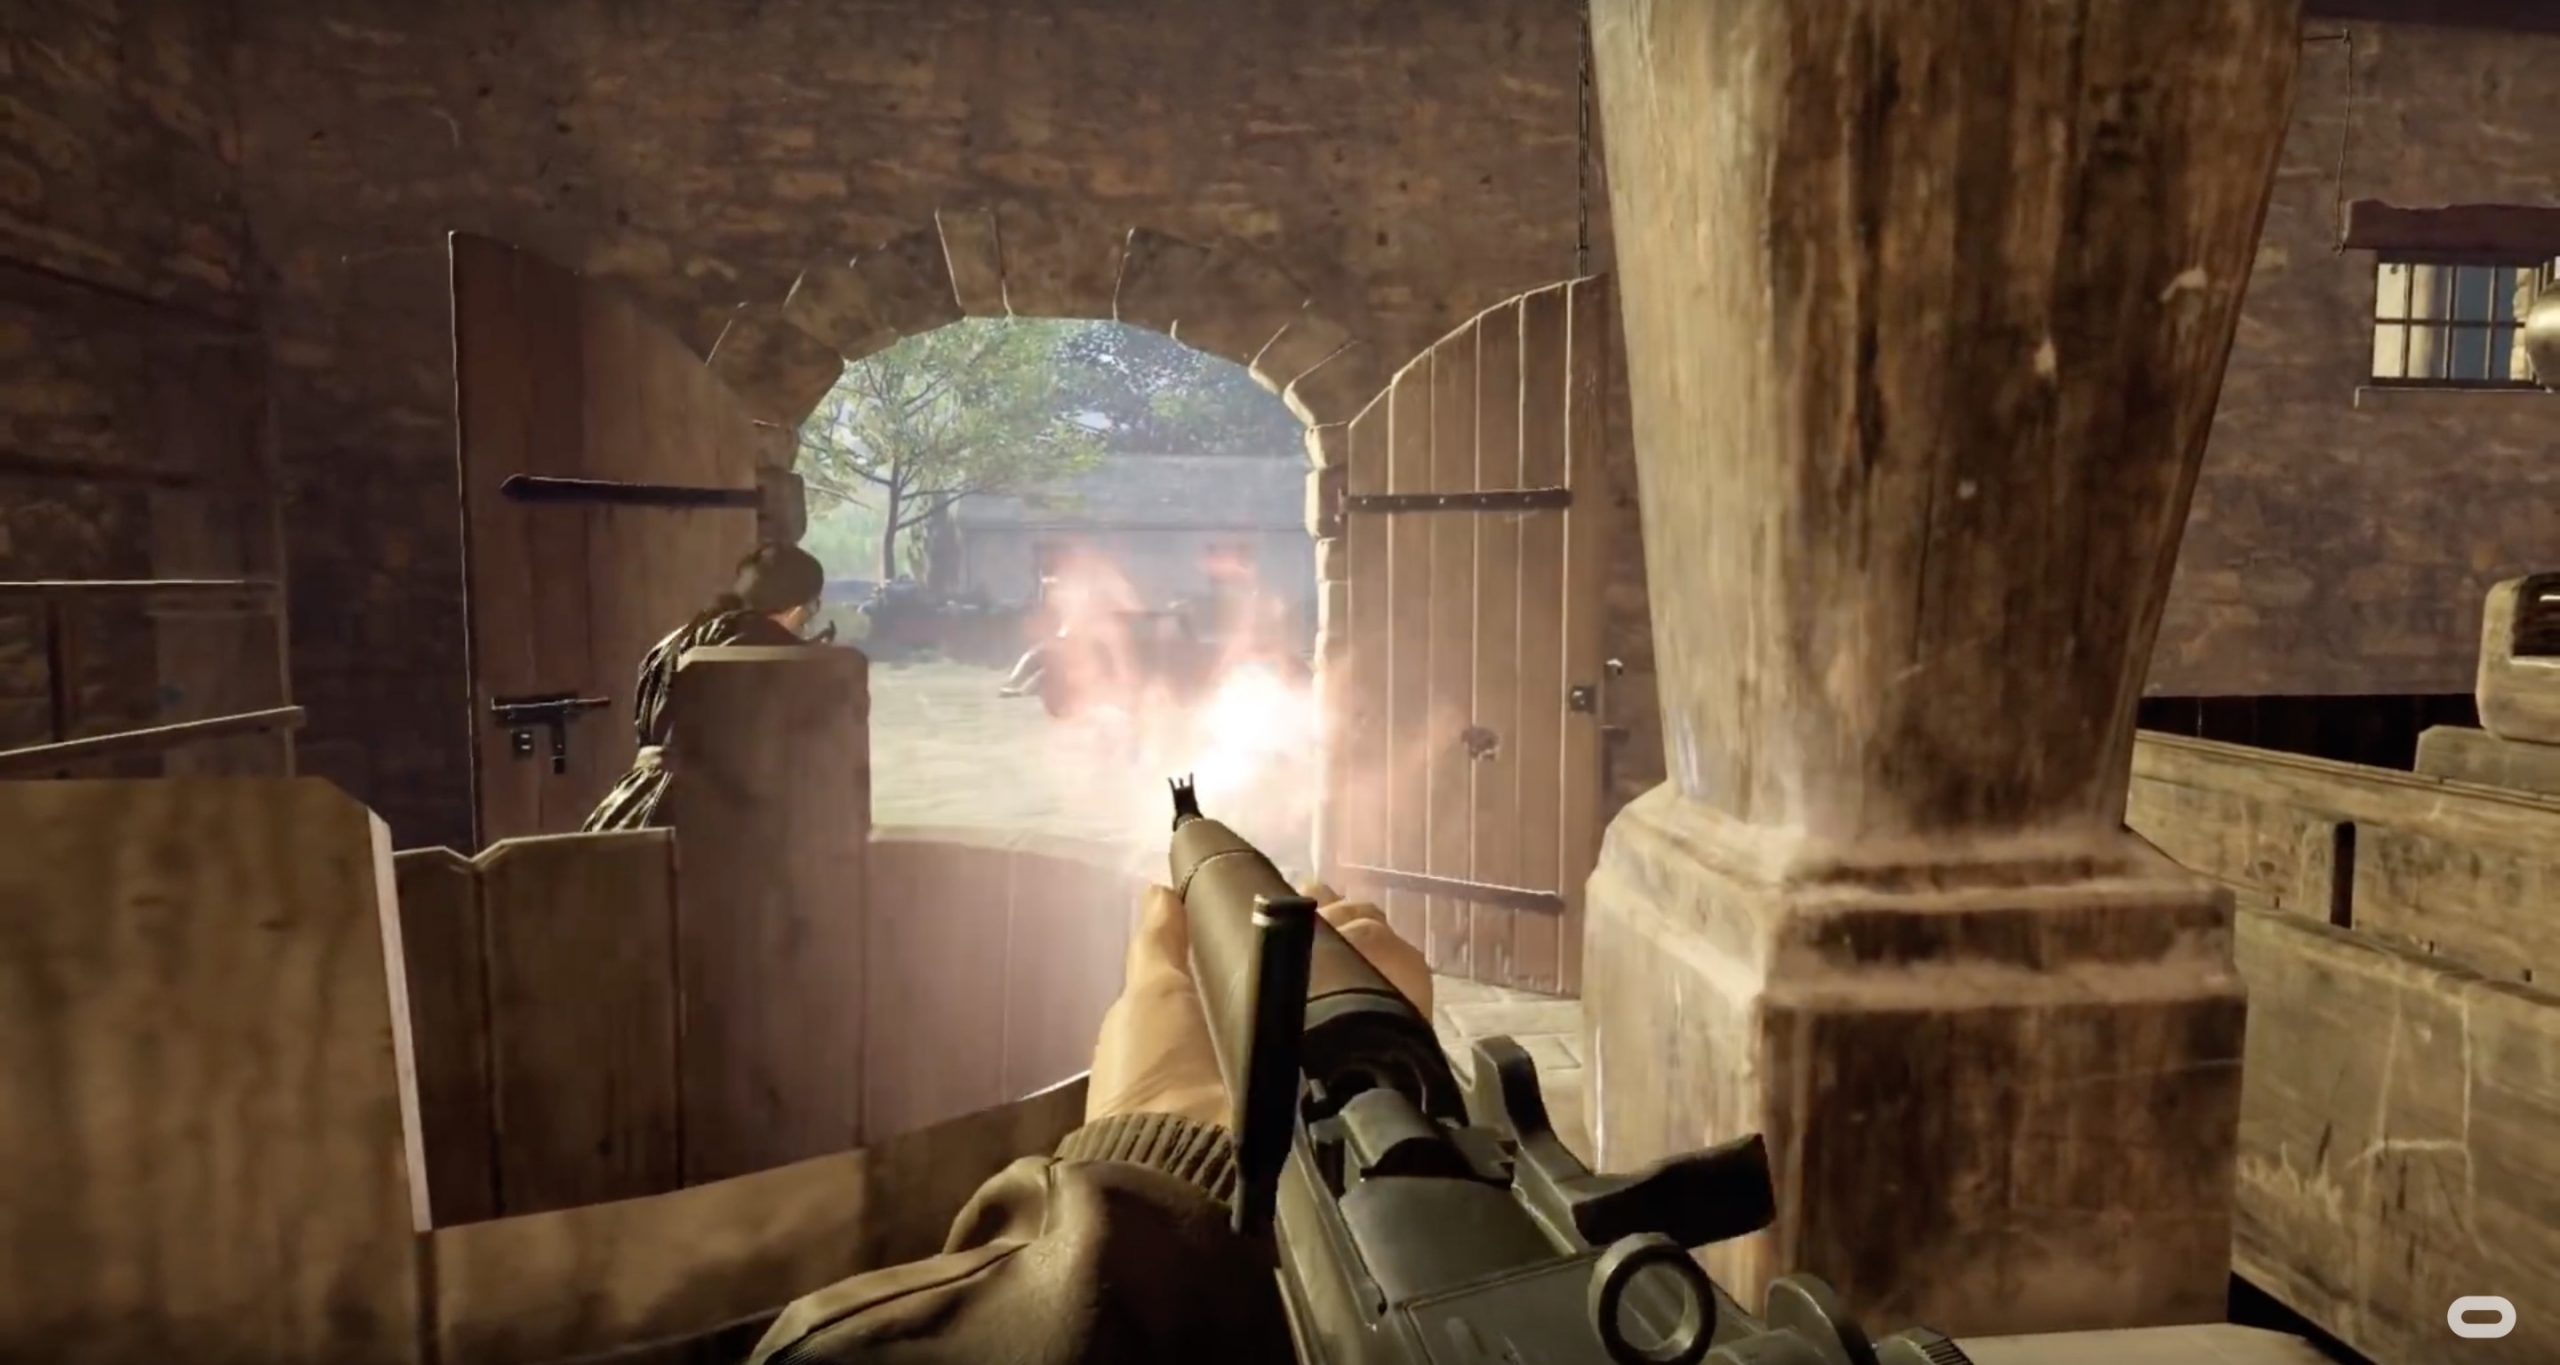 В рамках открытия gamescom представят сюжетный трейлер Medal of Honor: Above and Beyond